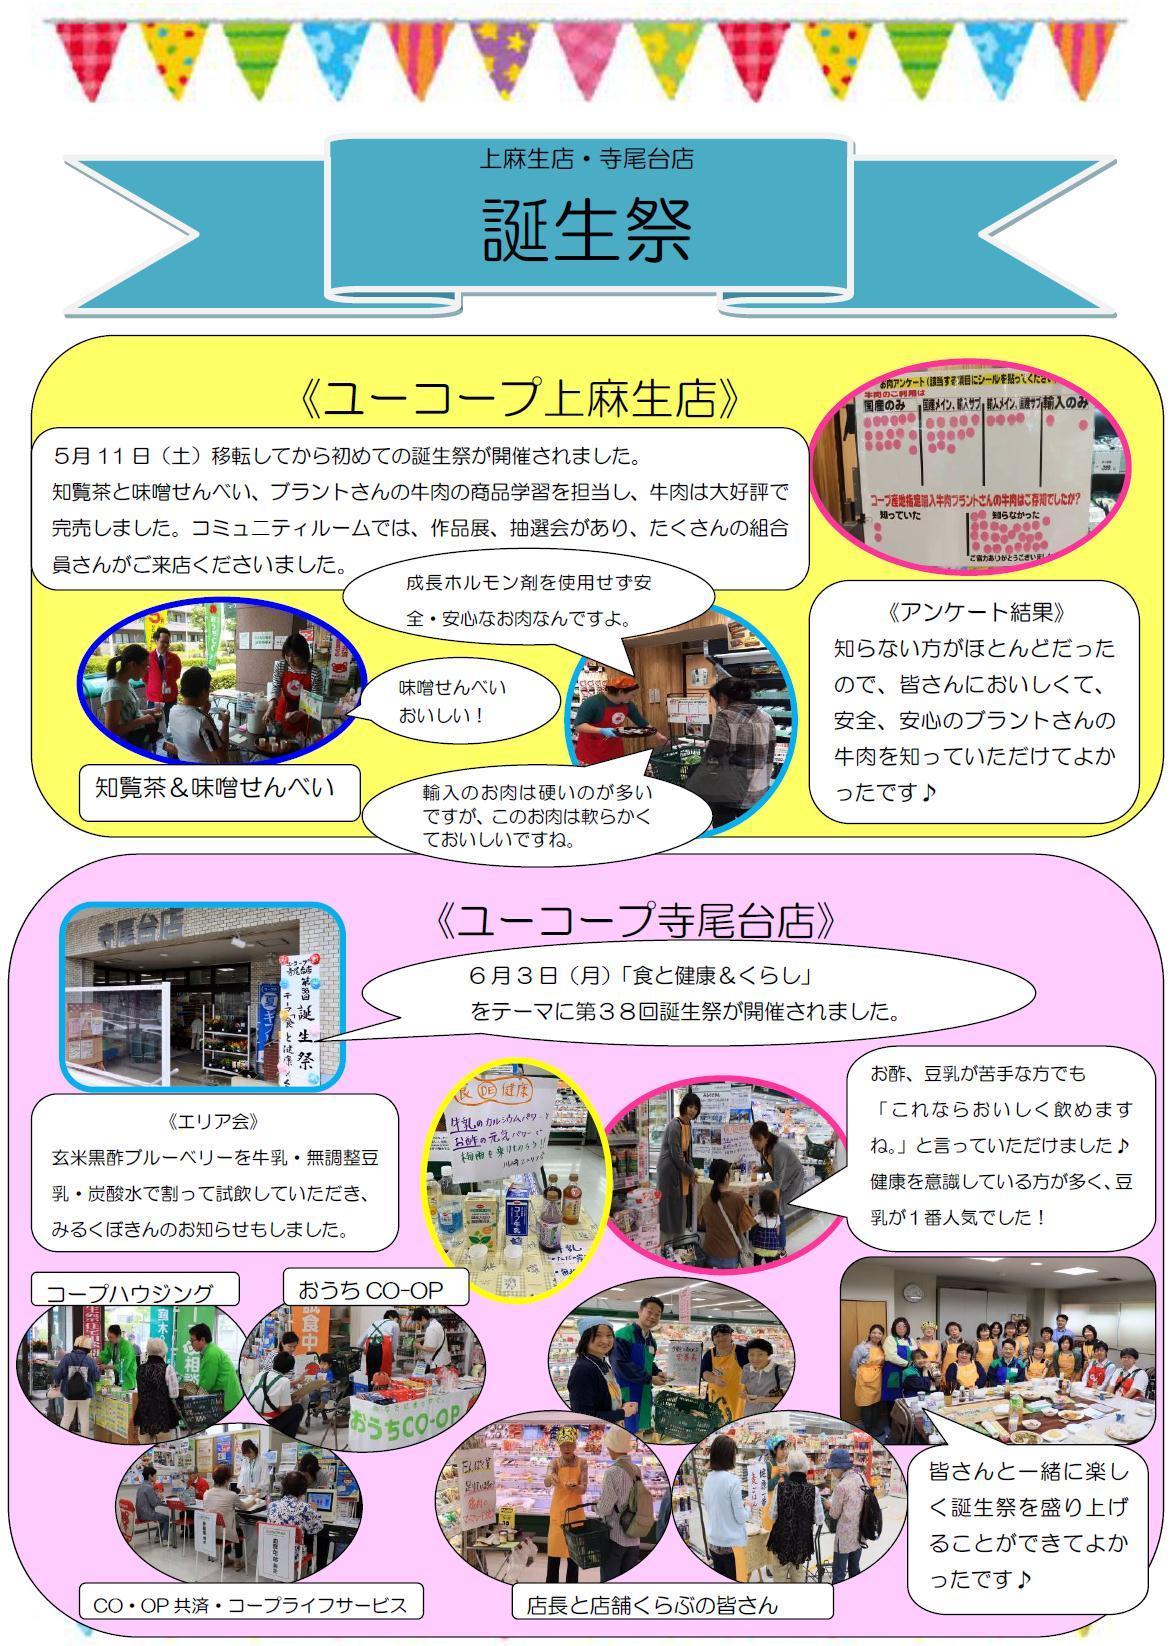 https://kanagawa.ucoop.or.jp/hiroba/areanews/files/2019kawasaki2tannjyousai.jpg